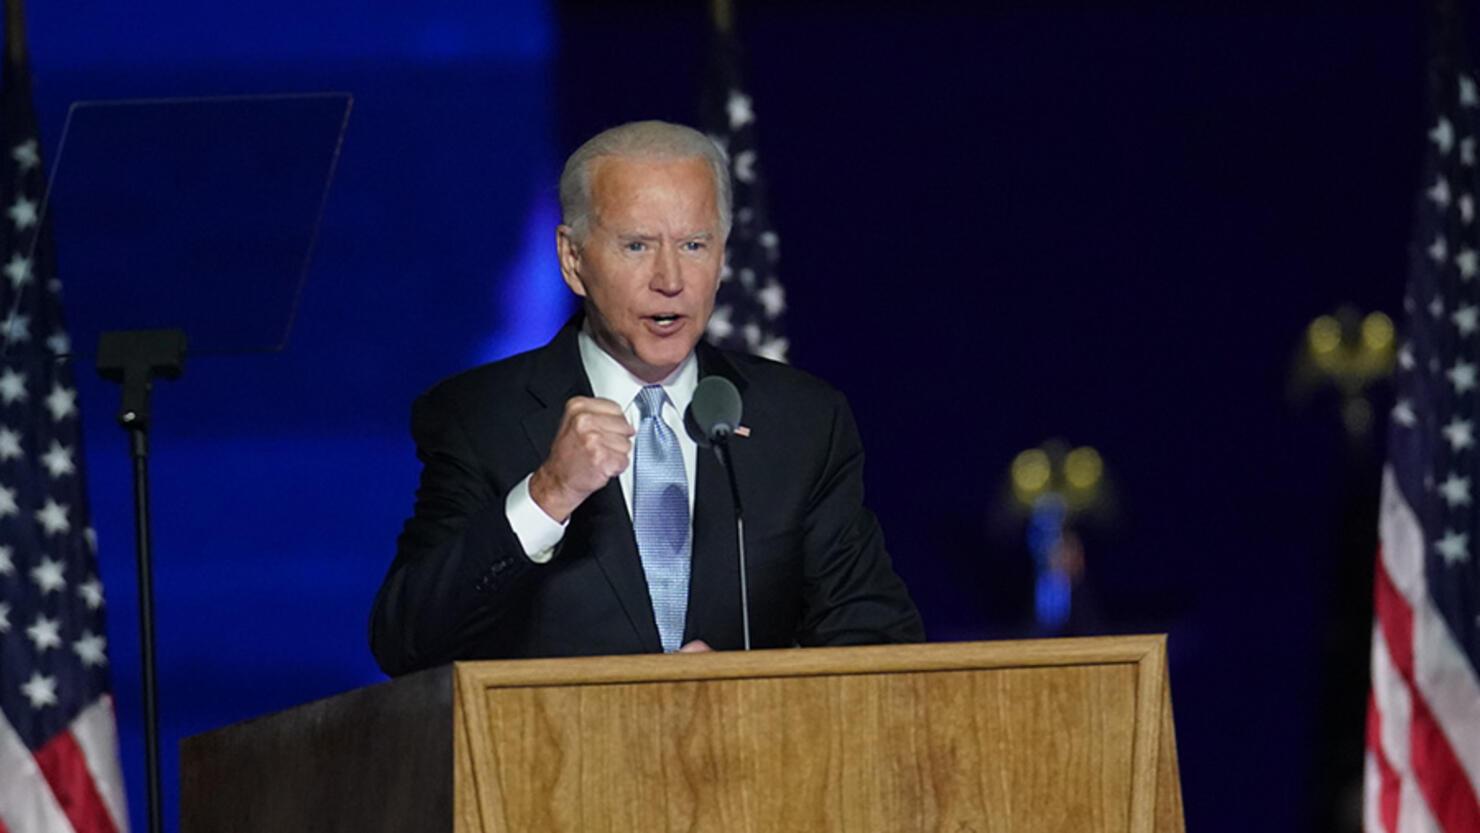 Joe Biden Delivers Remarks After Winning U.S. Presidency